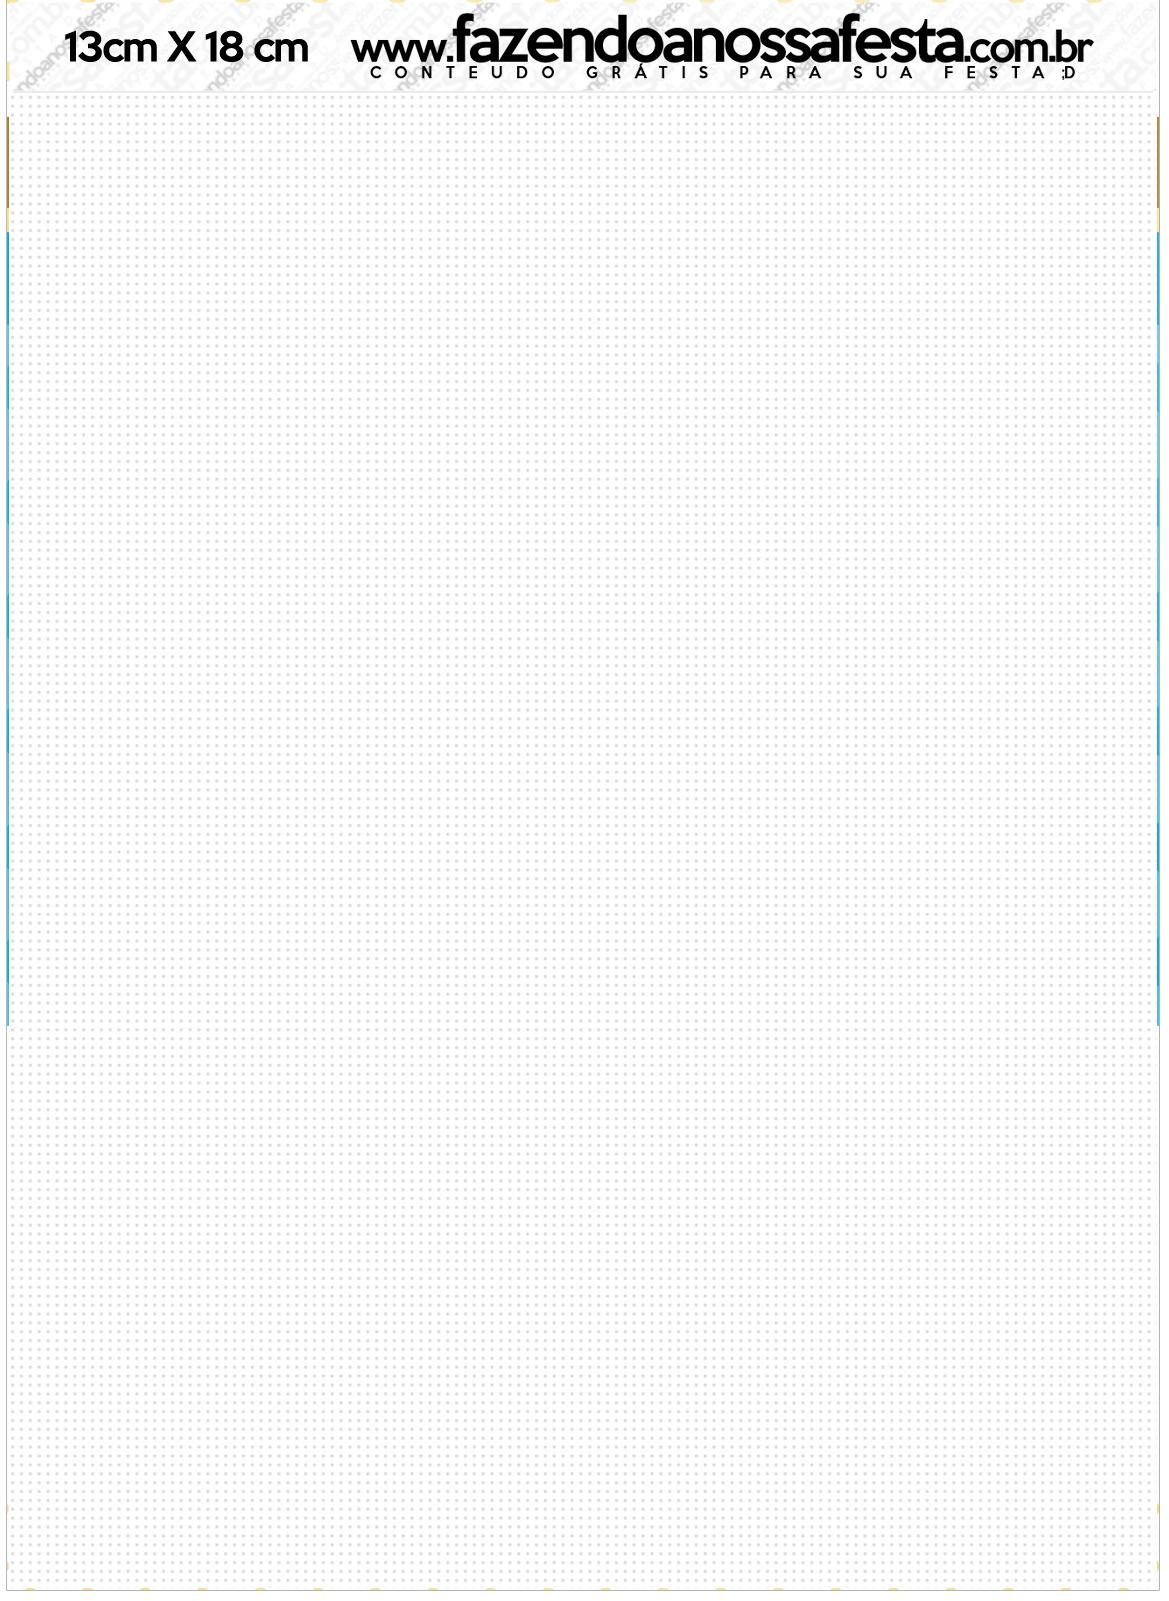 Convite Envelope Carrossel Azul